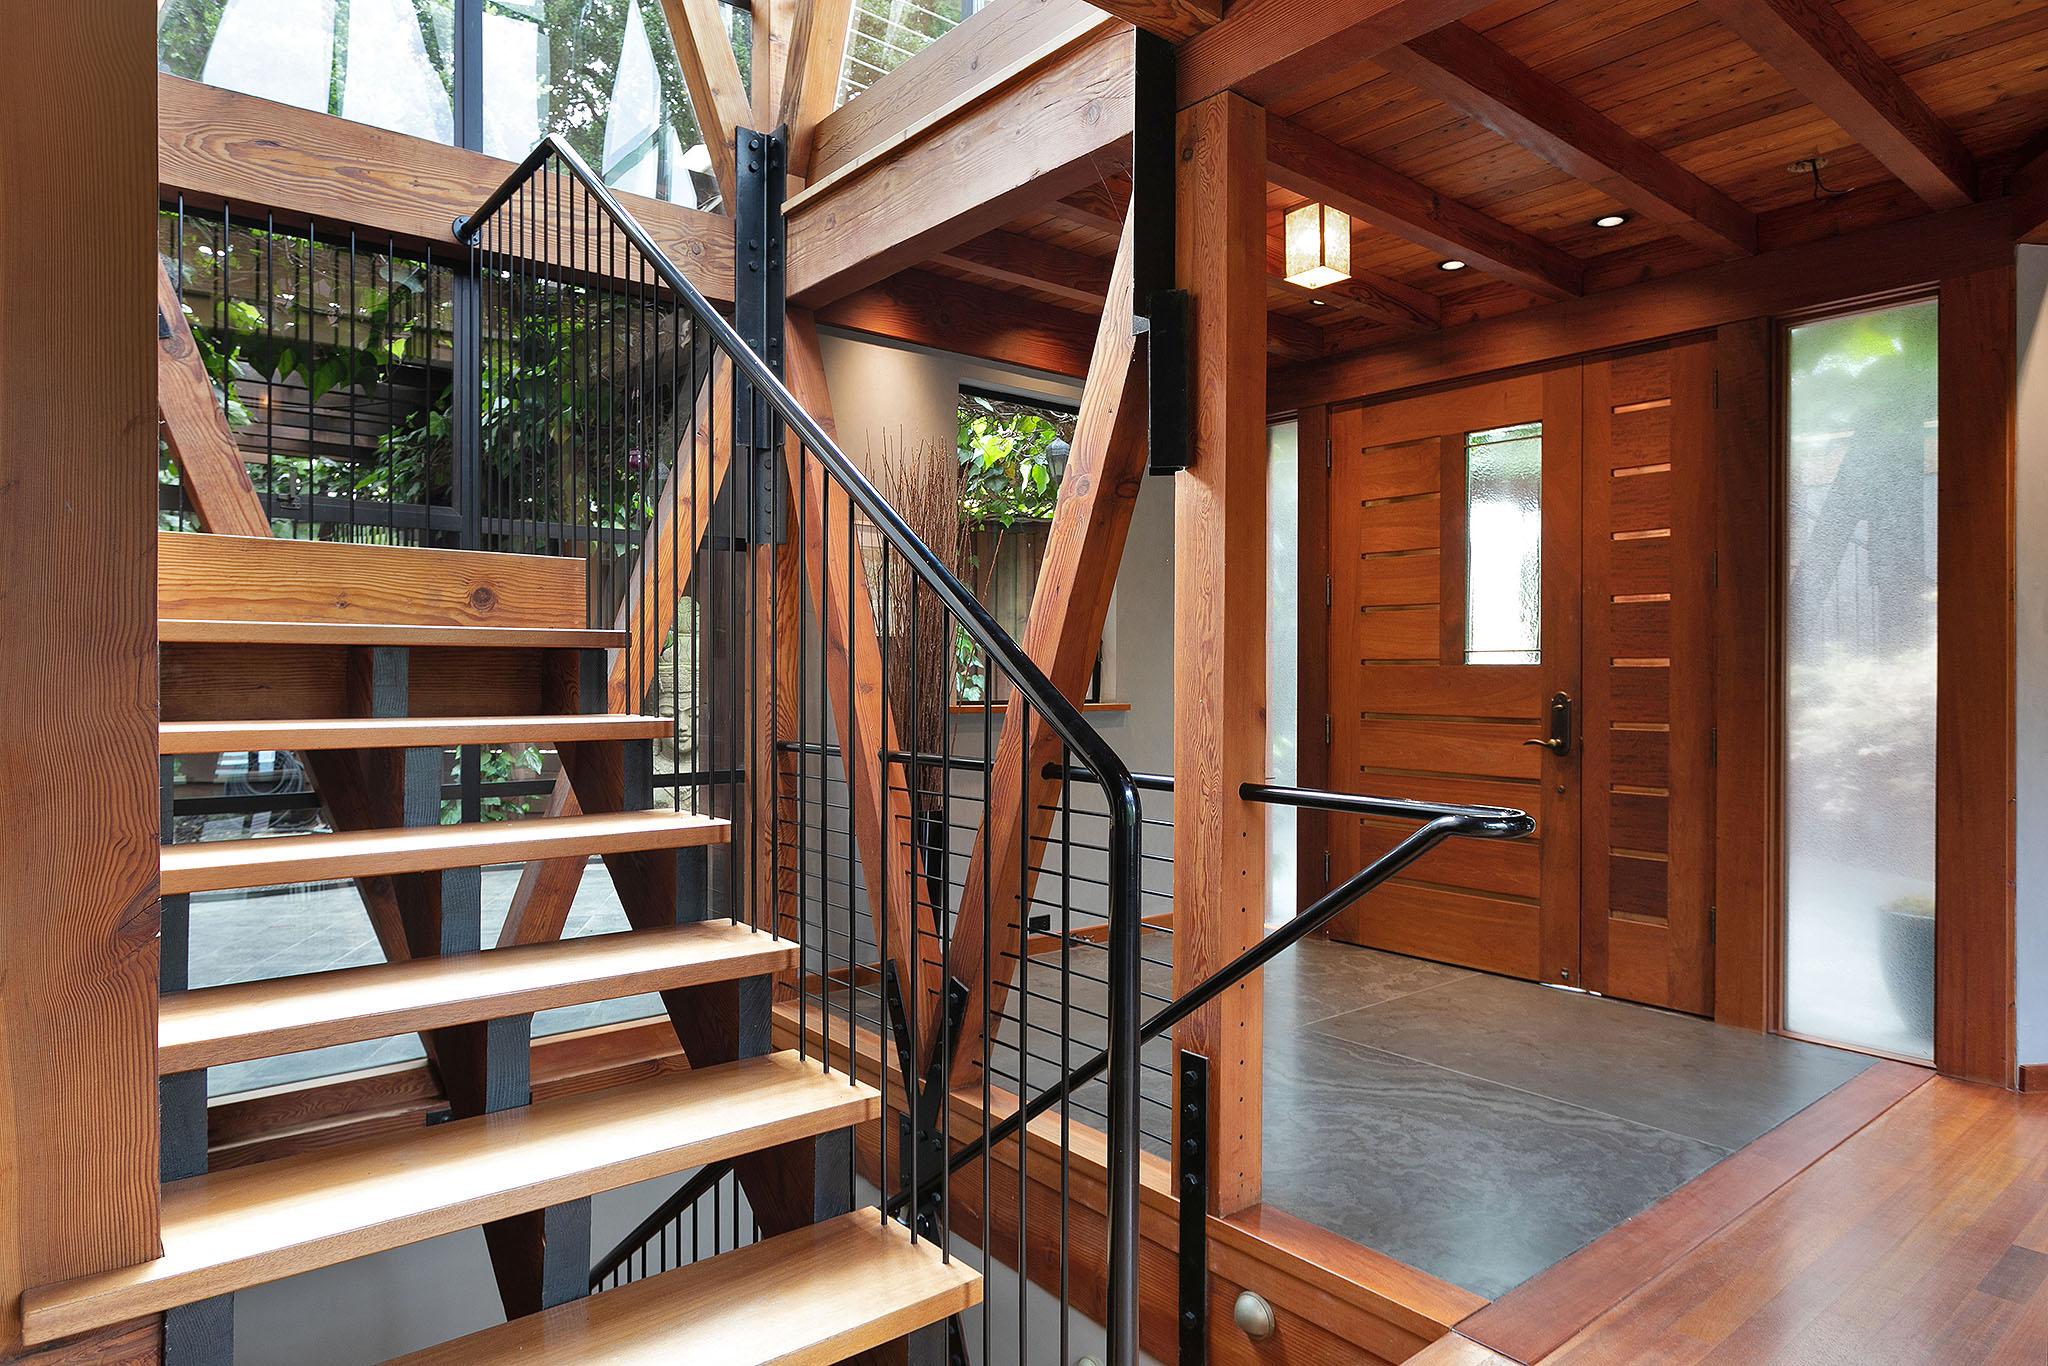 04 Staircase1.jpg